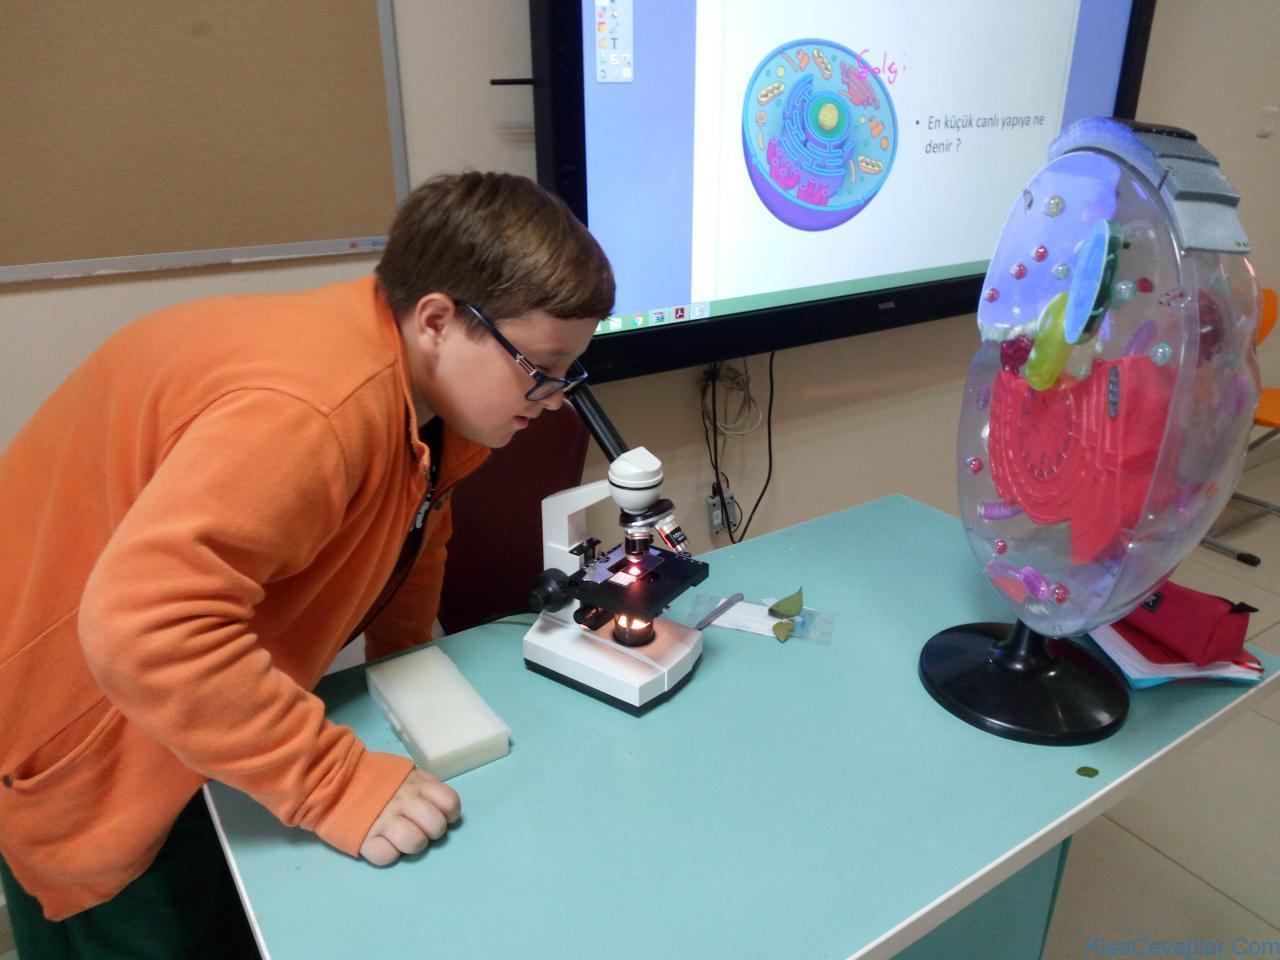 mikroskop hücre ile ilgili görsel sonucu